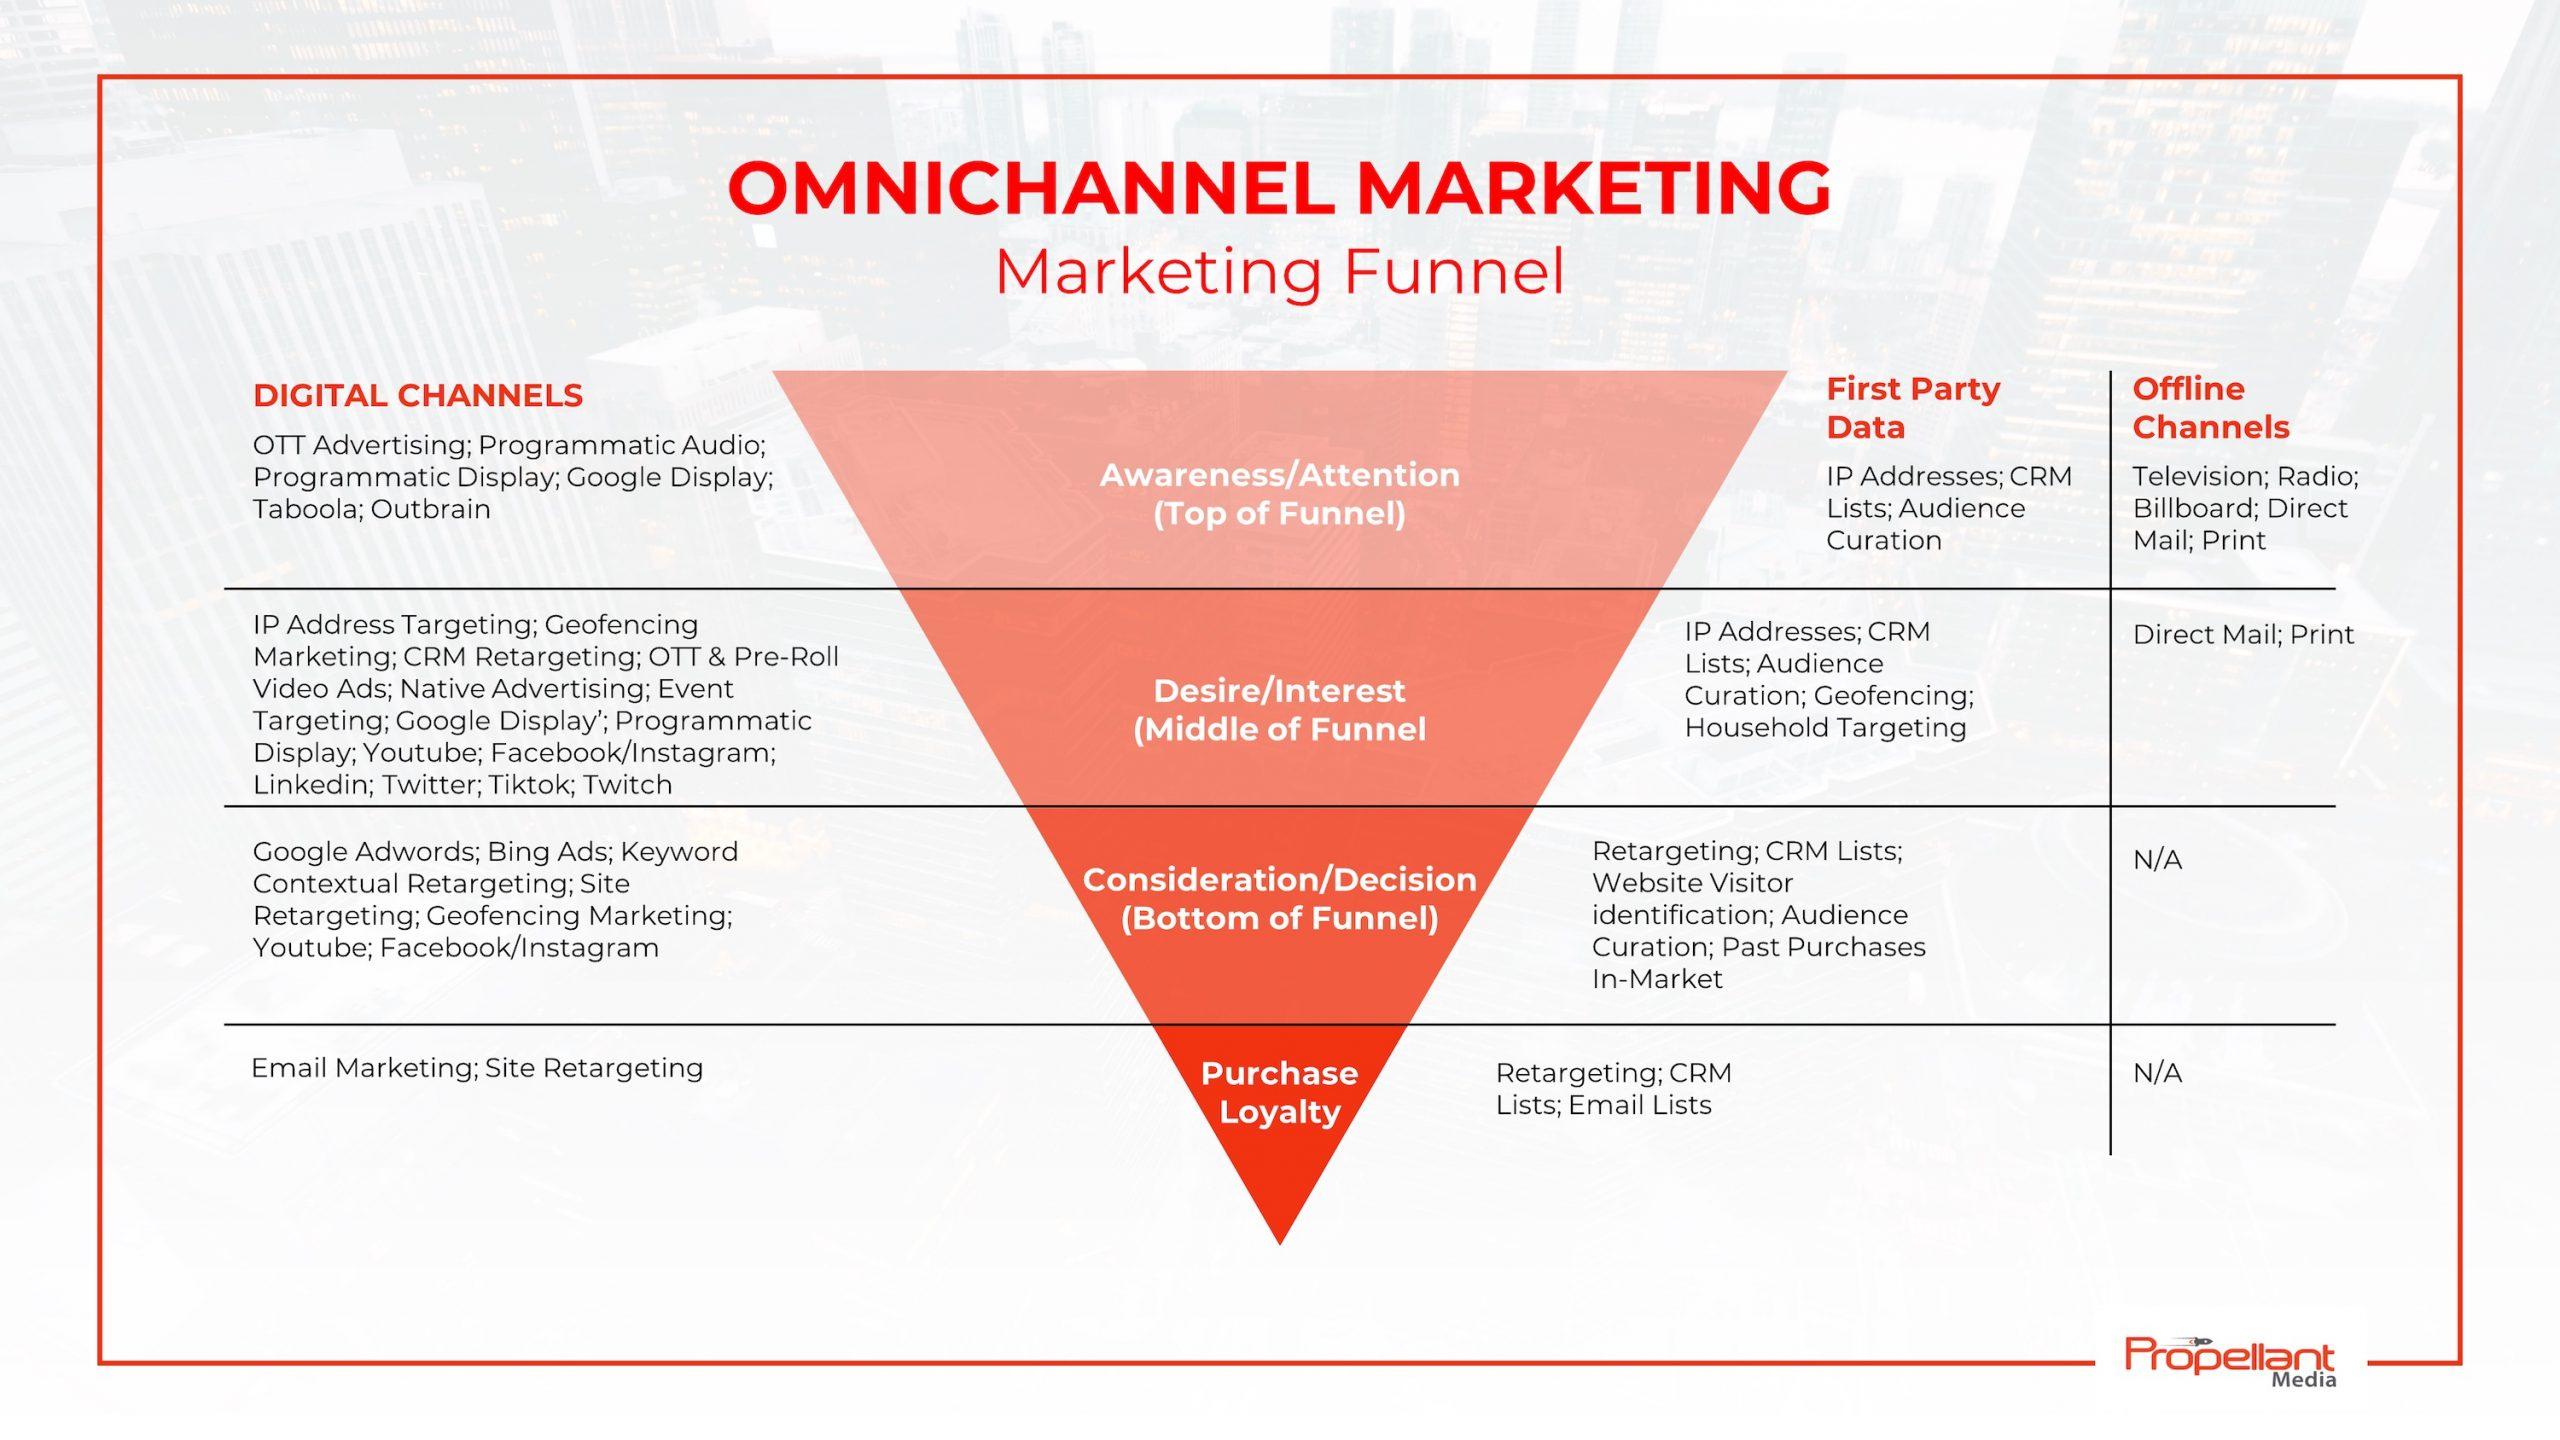 omni channel marketing funnel